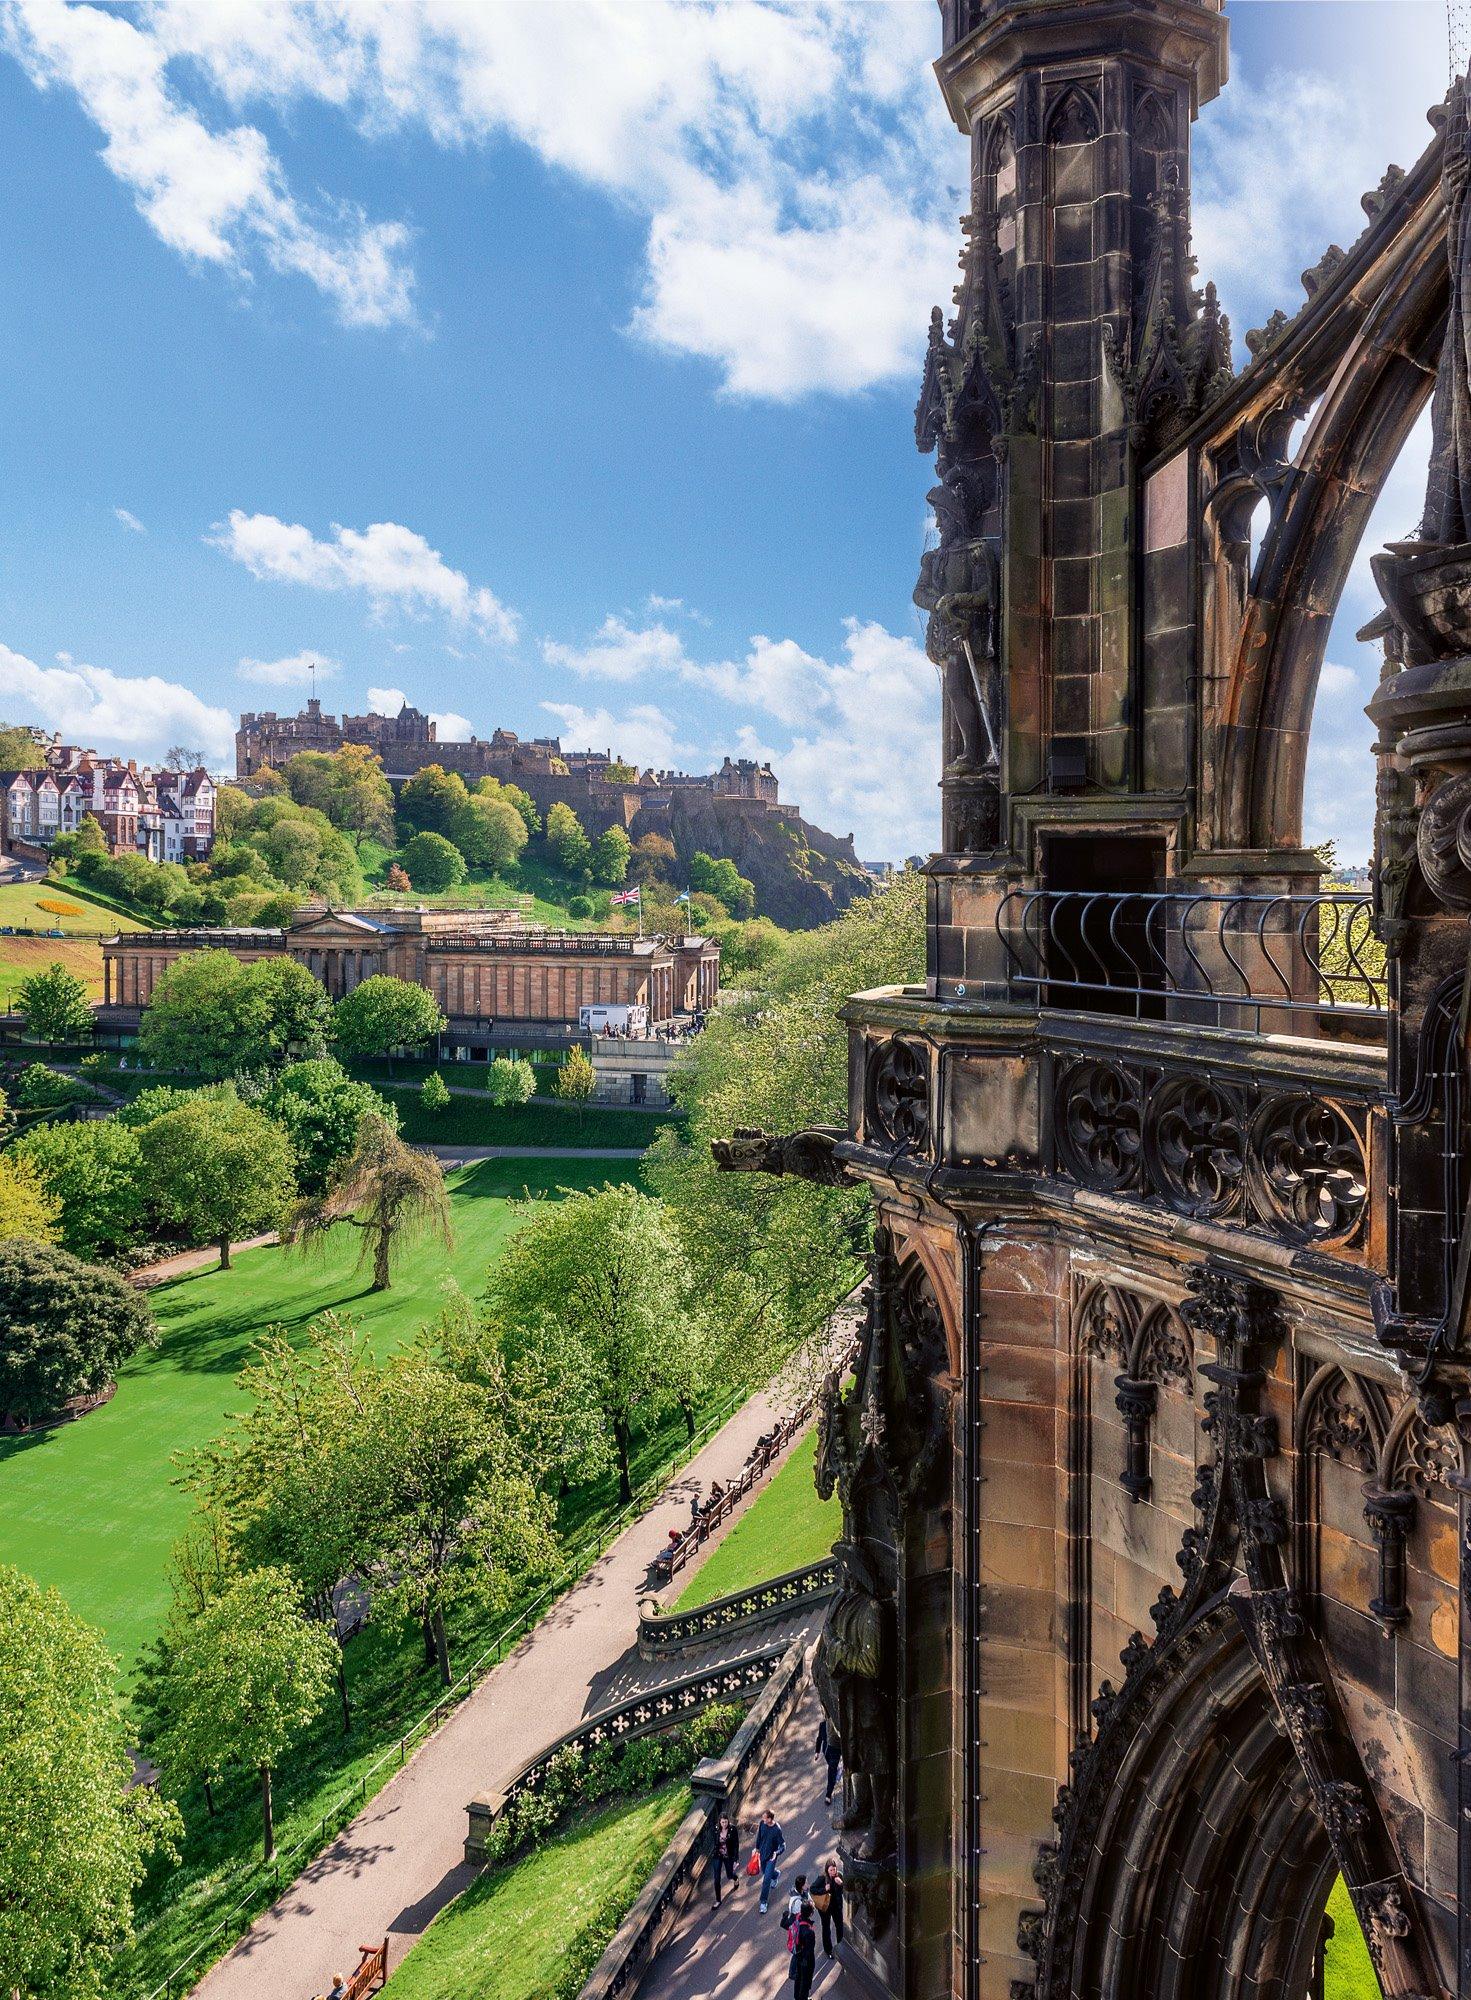 42-55484278. Edimburgo y la Ruta del Whisky